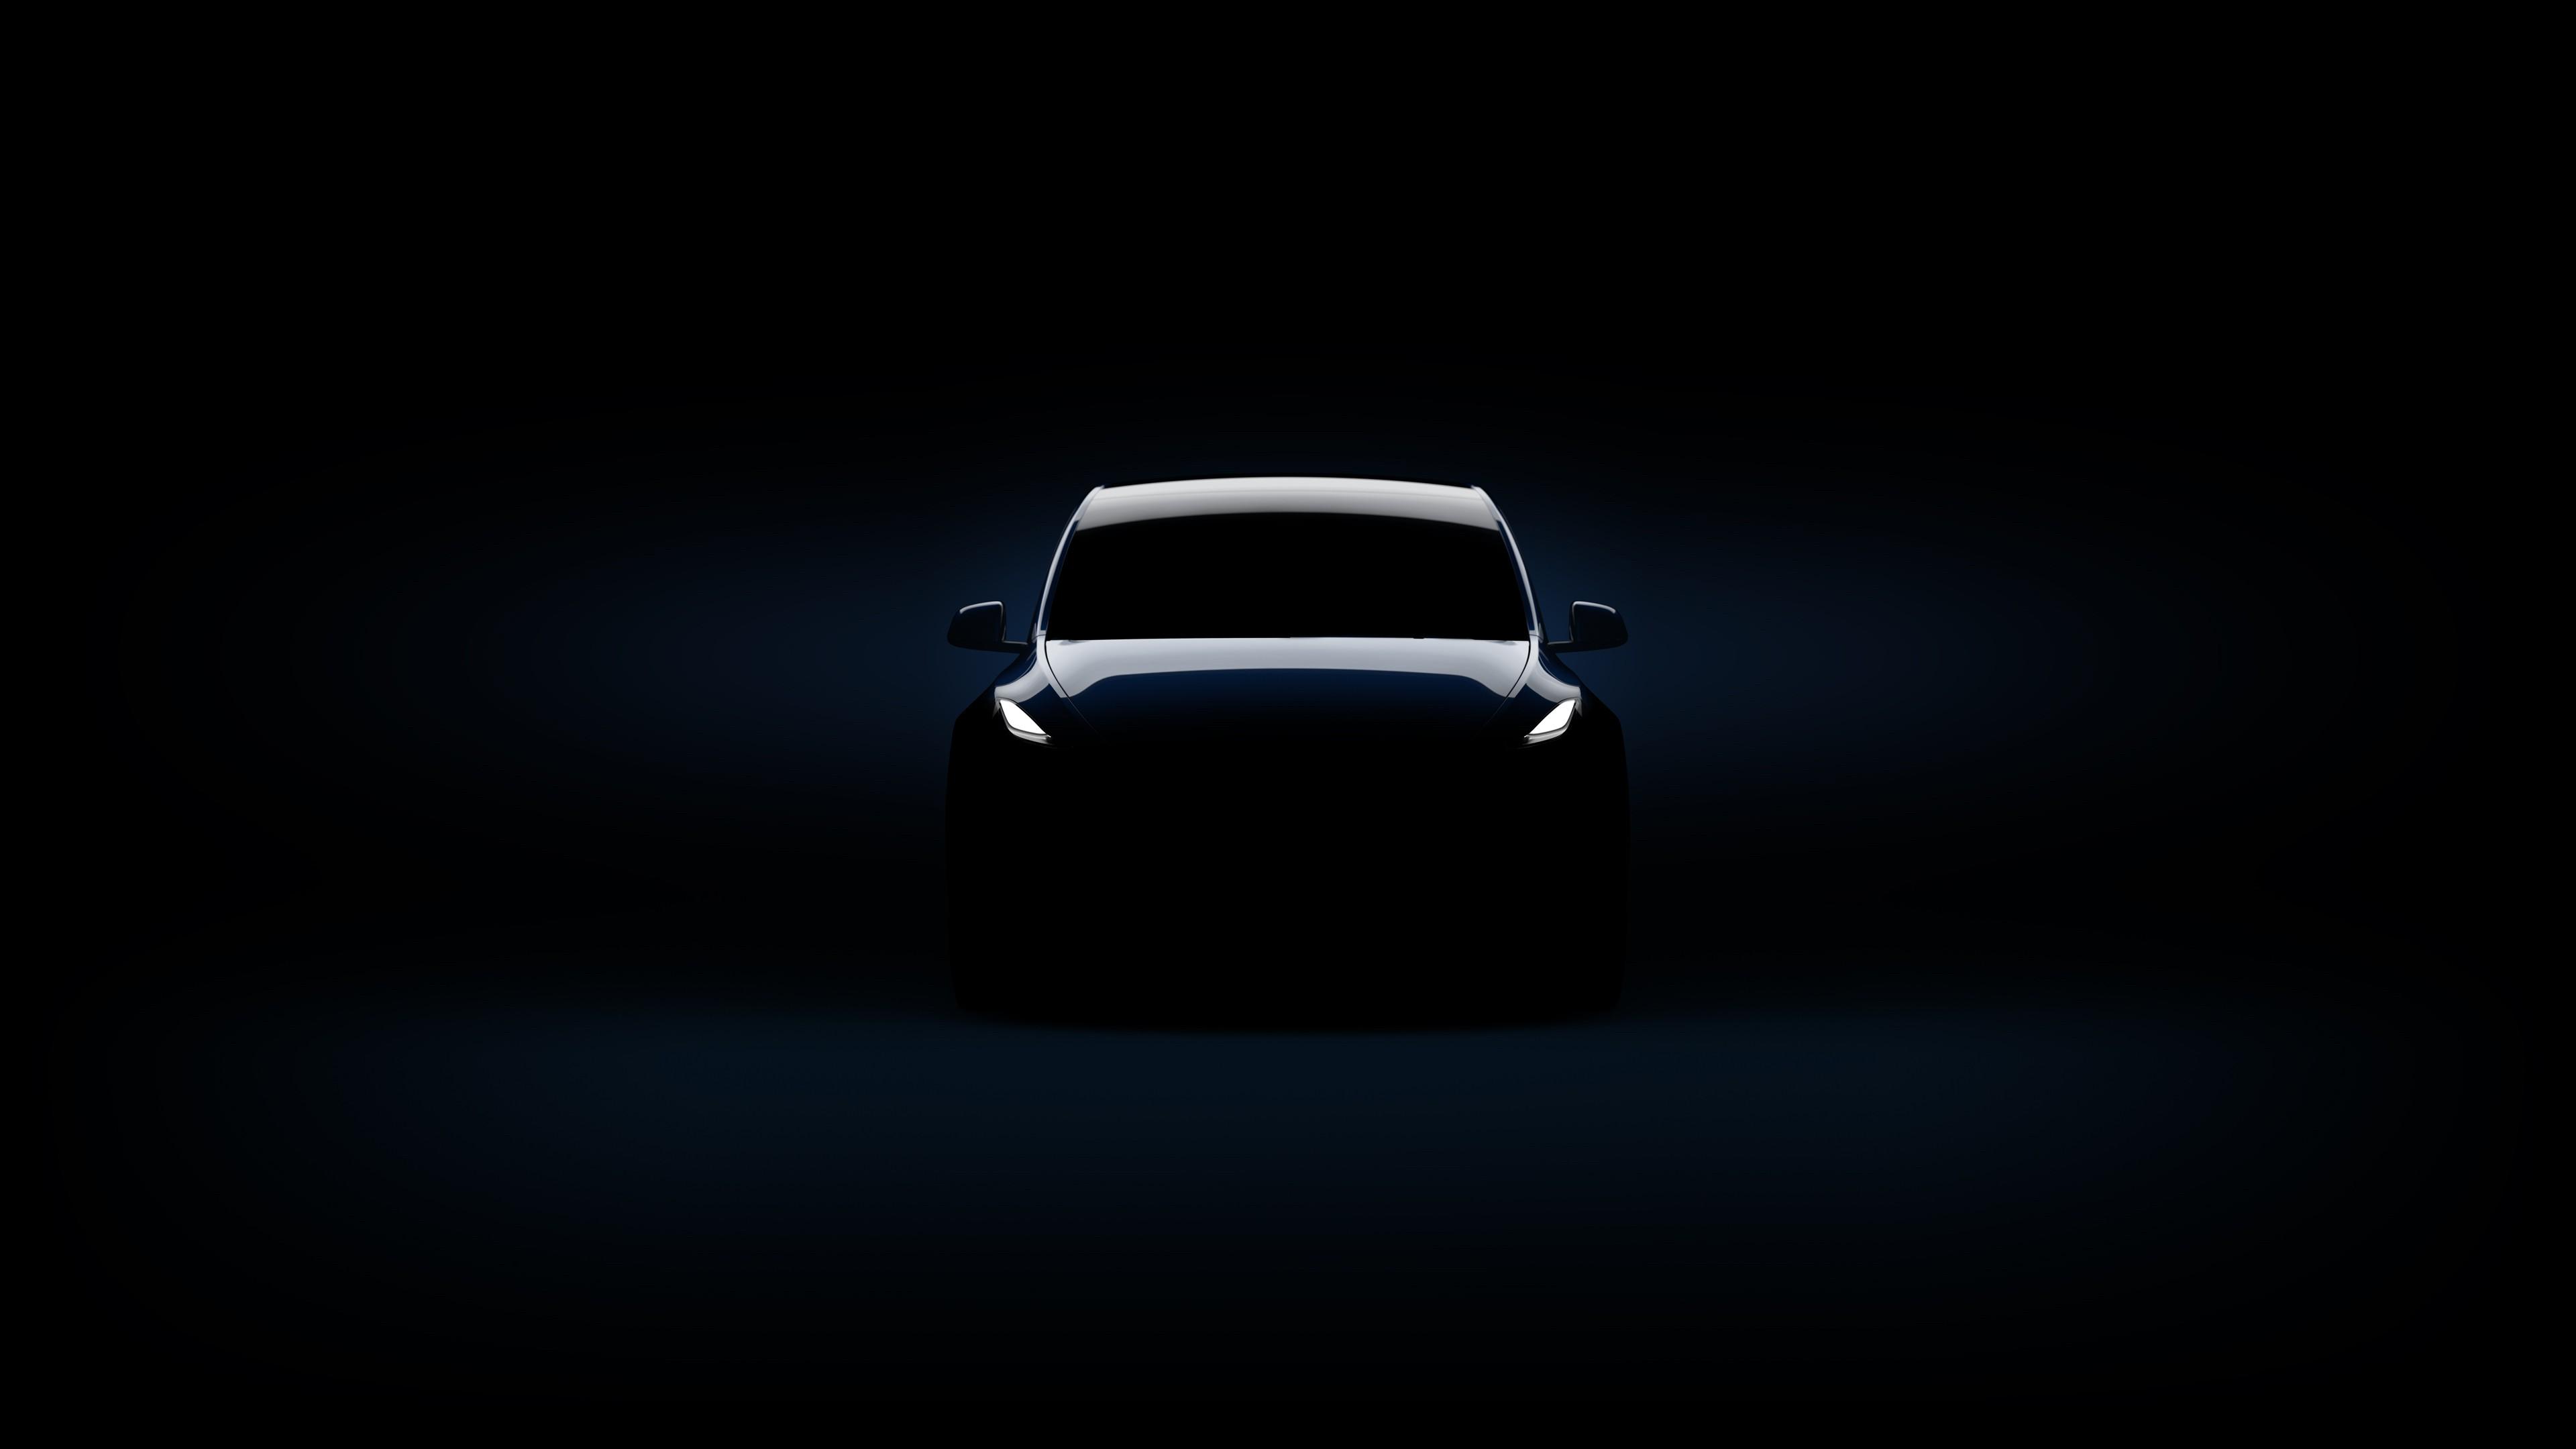 2019 Tesla Model Y 4k Hd Cars 4k Wallpapers Images